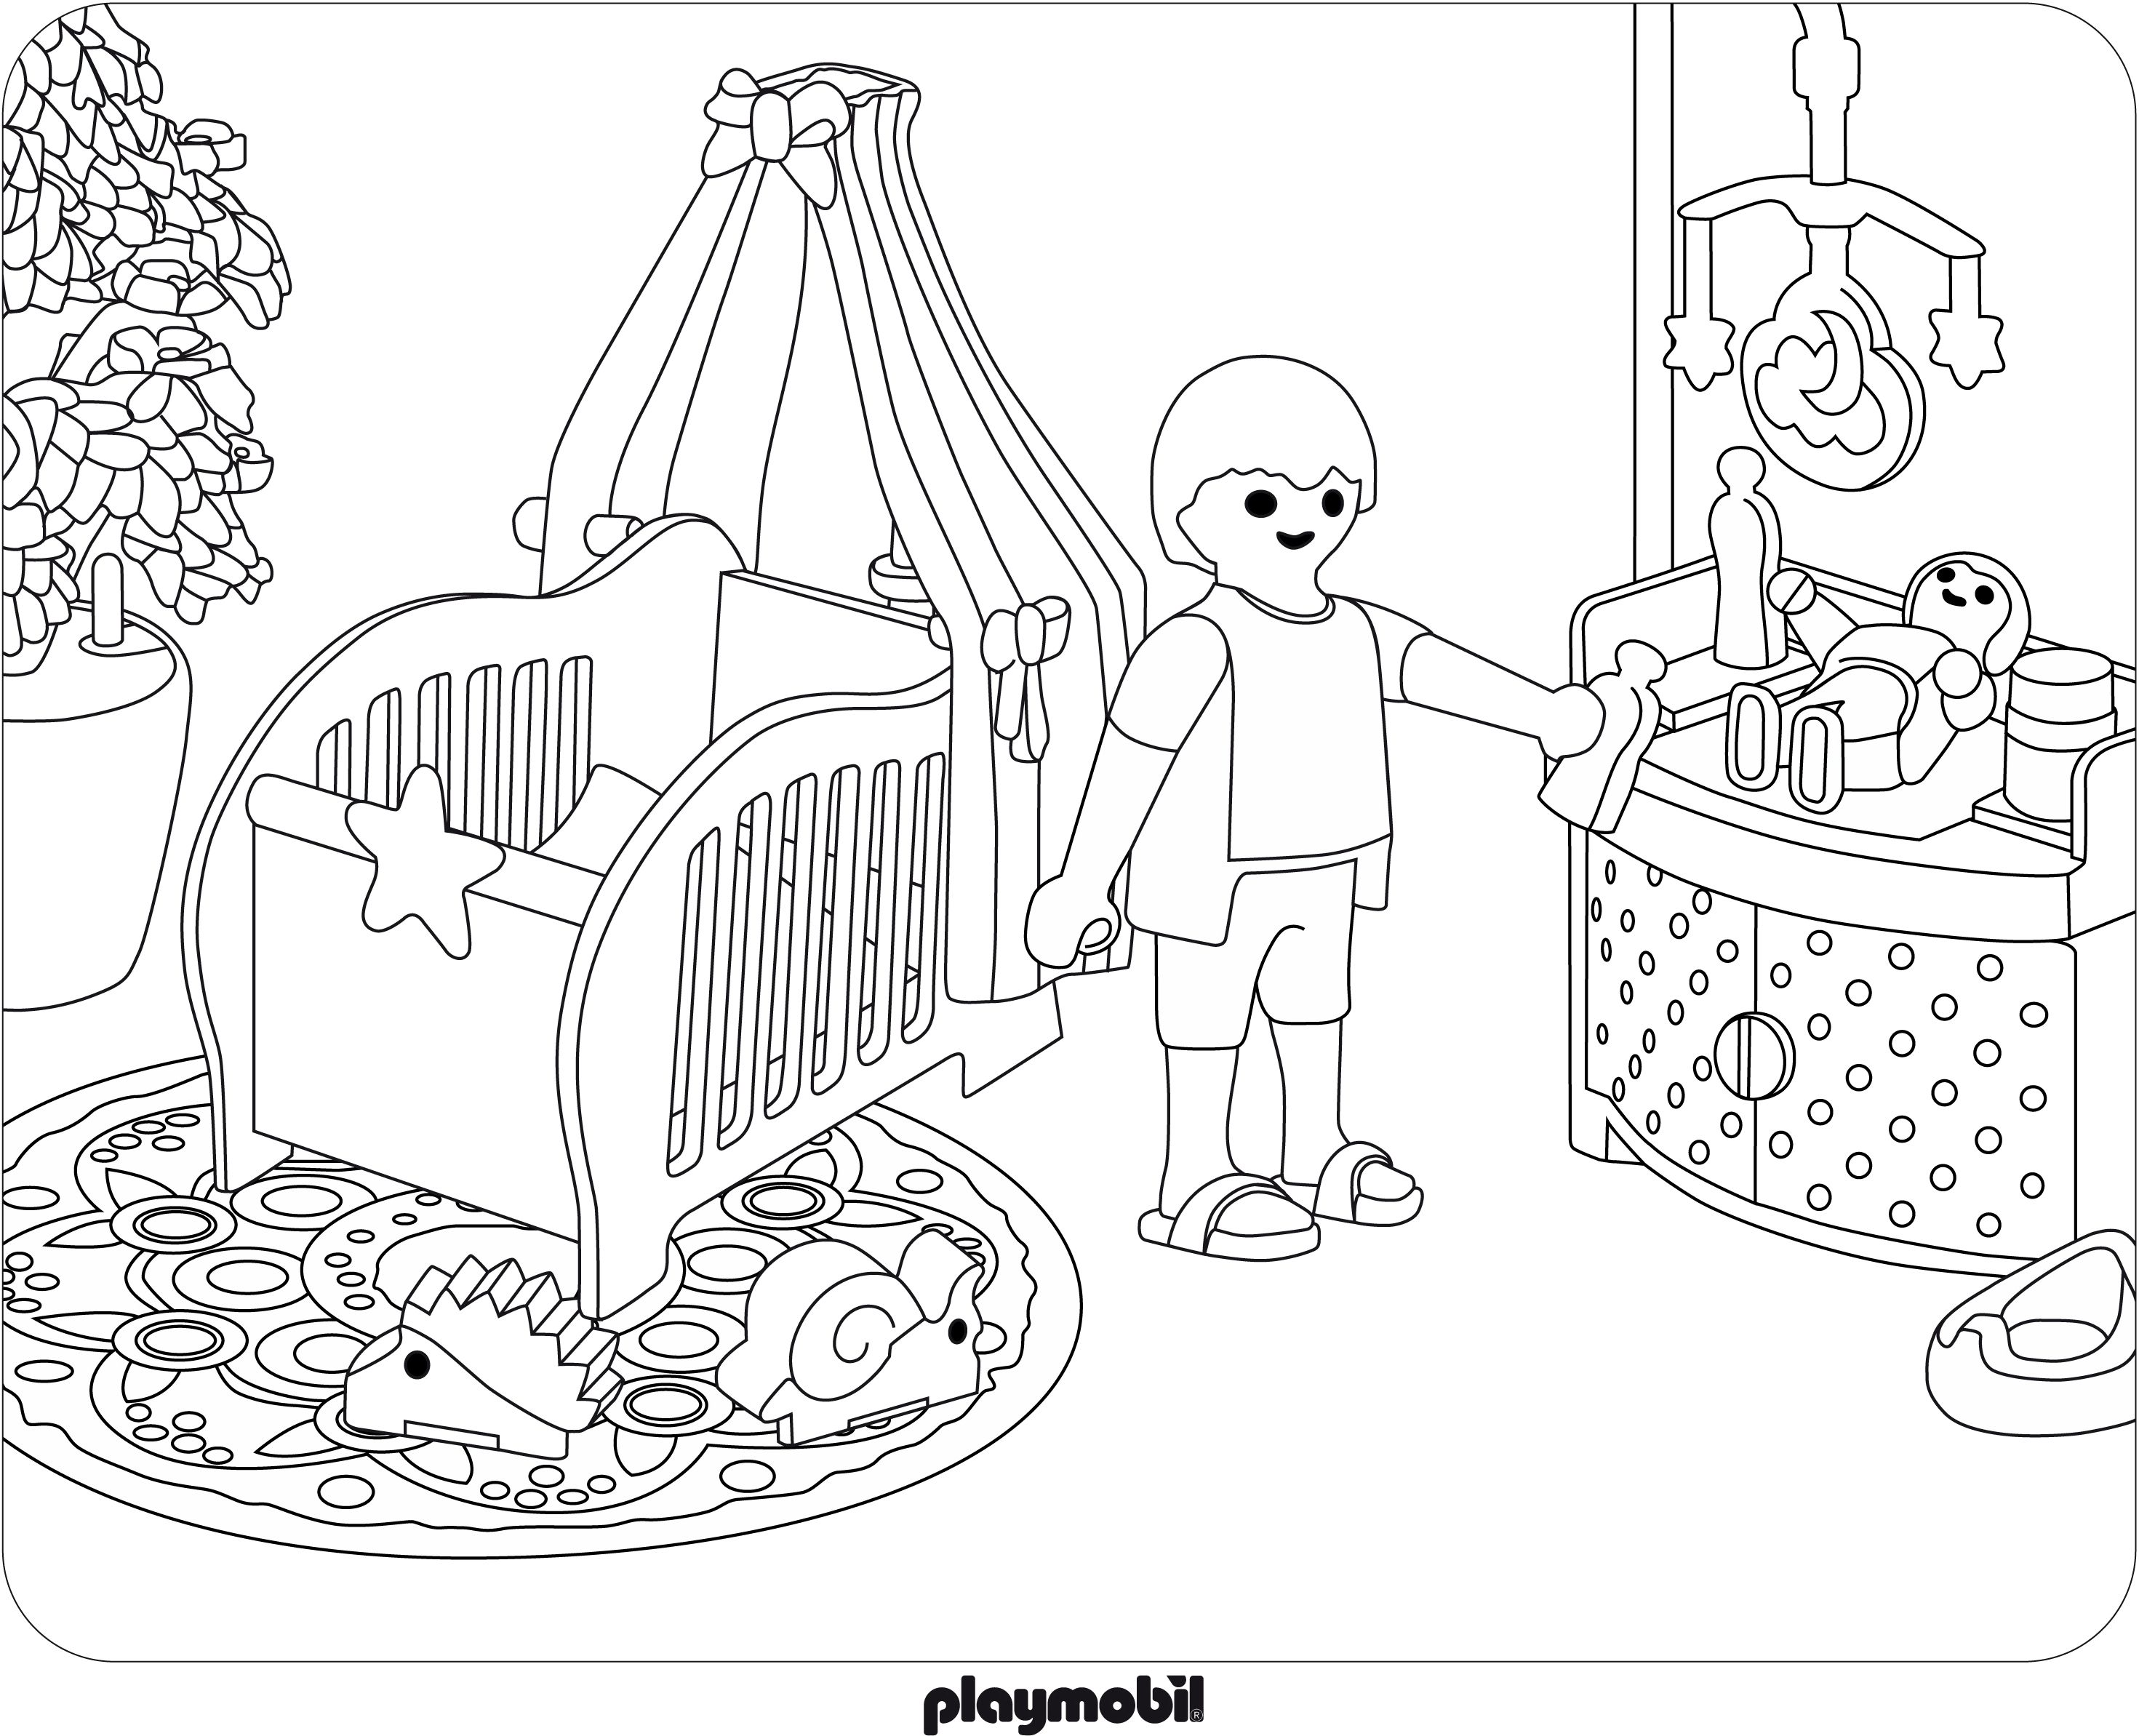 Playmobil Campingplatz Ausmalbilder : Pin By Eva Gubik On Coloring 3 Pinterest Coloring Books